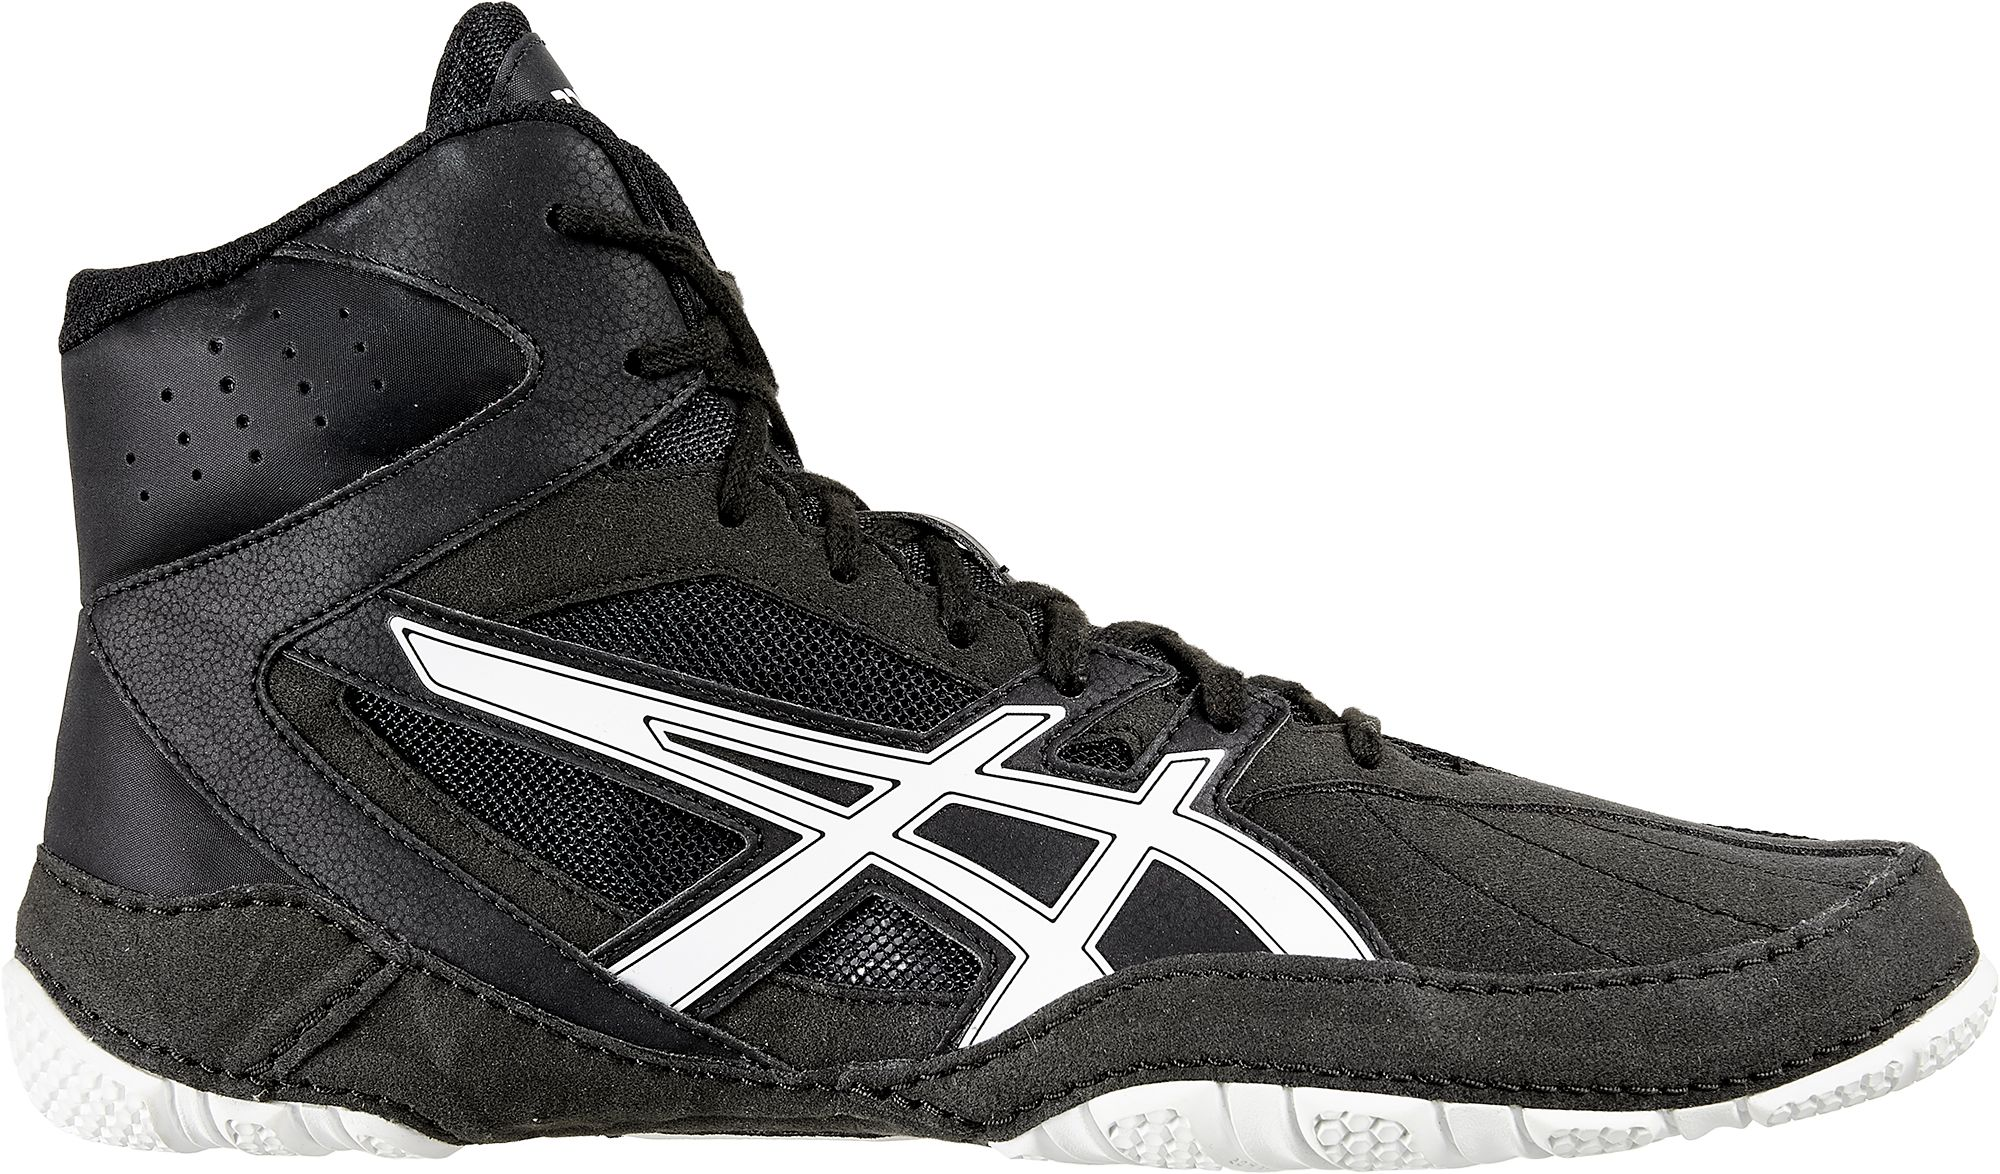 new asics wrestling shoes